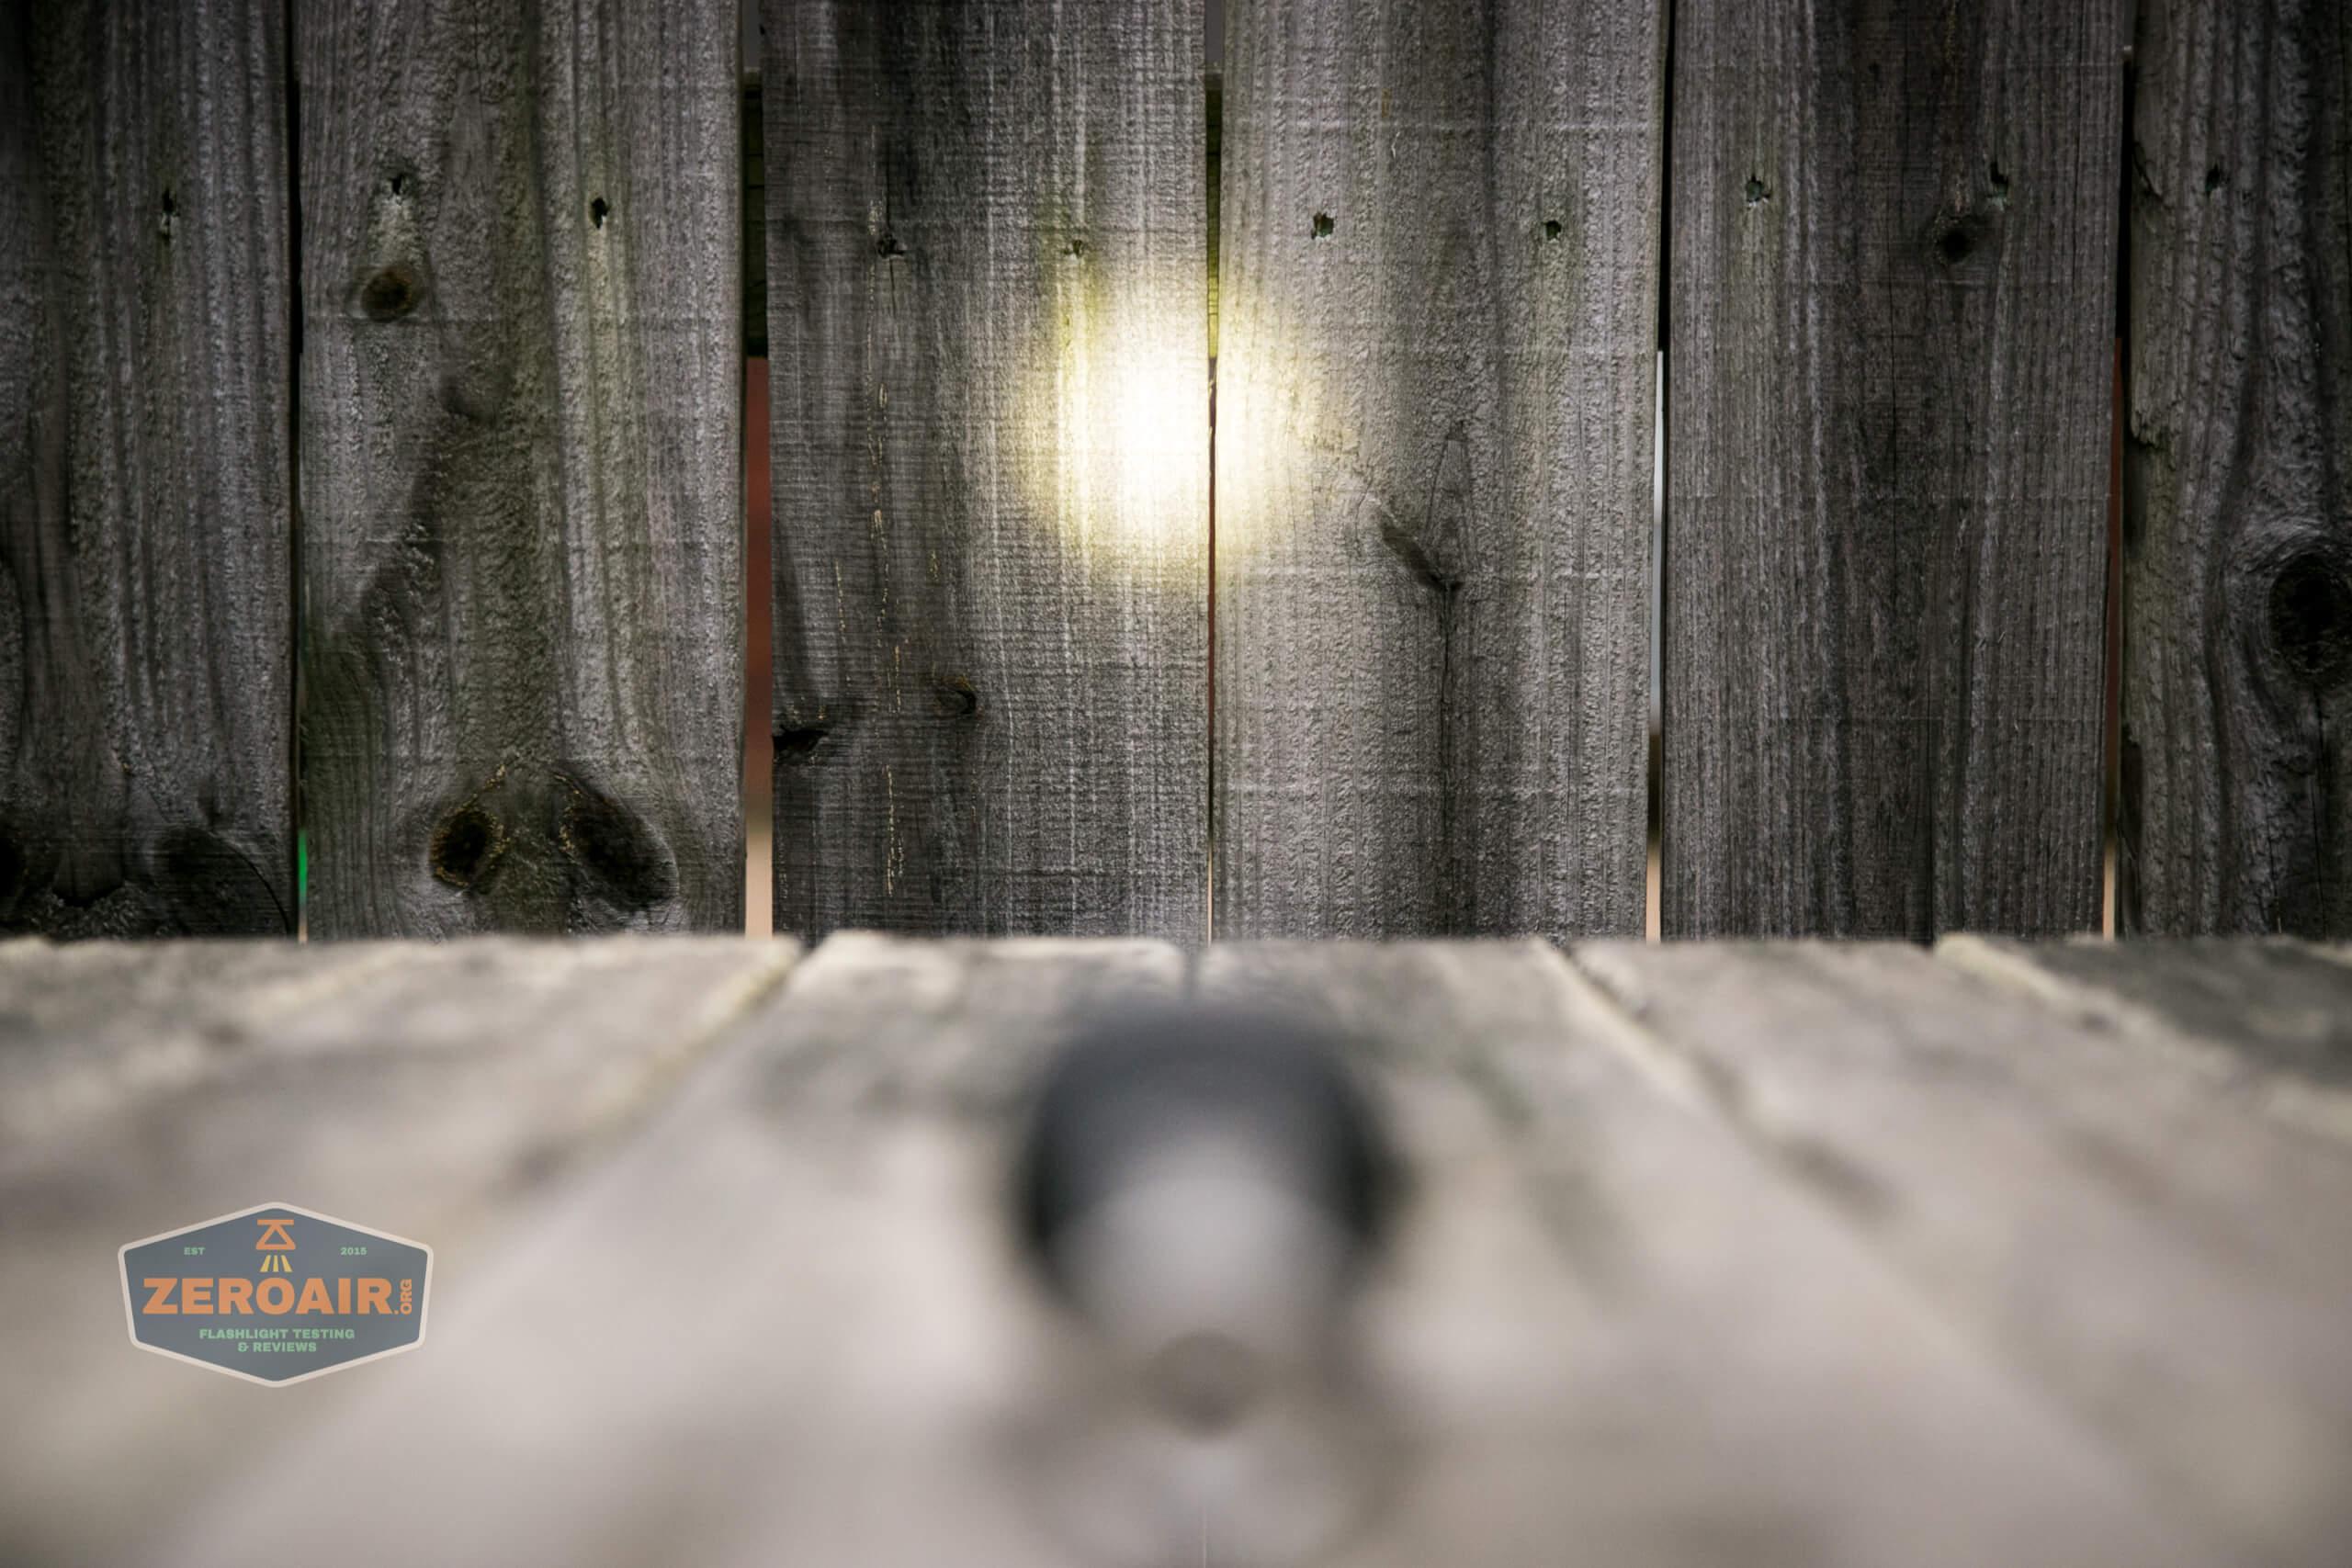 Manker MC13 thrower flashlight emitter beamshot fence